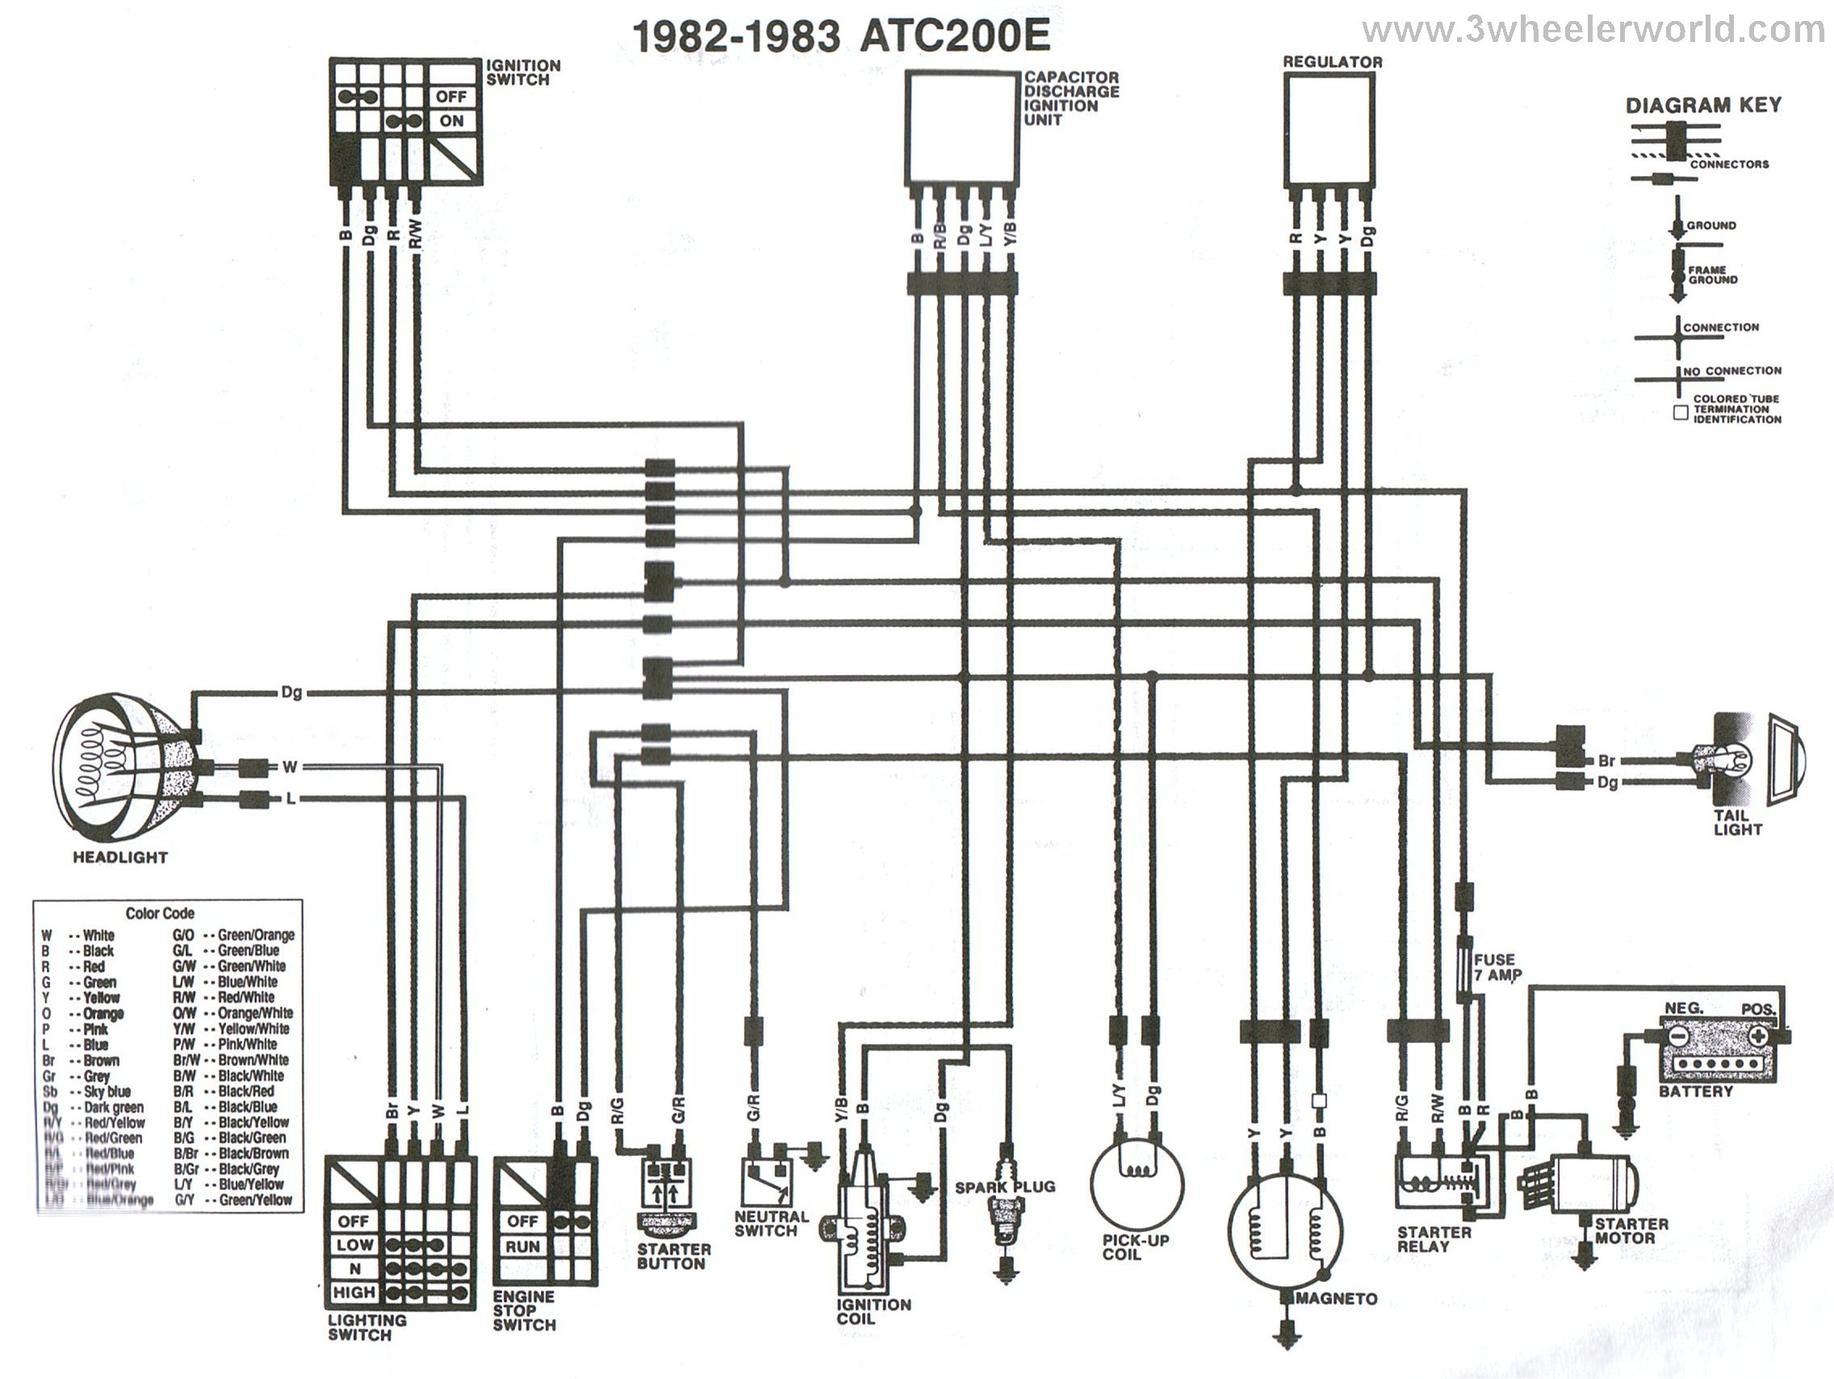 hight resolution of honda 300 fourtrax ignition wiring diagram honda 300 fourtrax ignition wiring diagram 1988 honda fourtrax